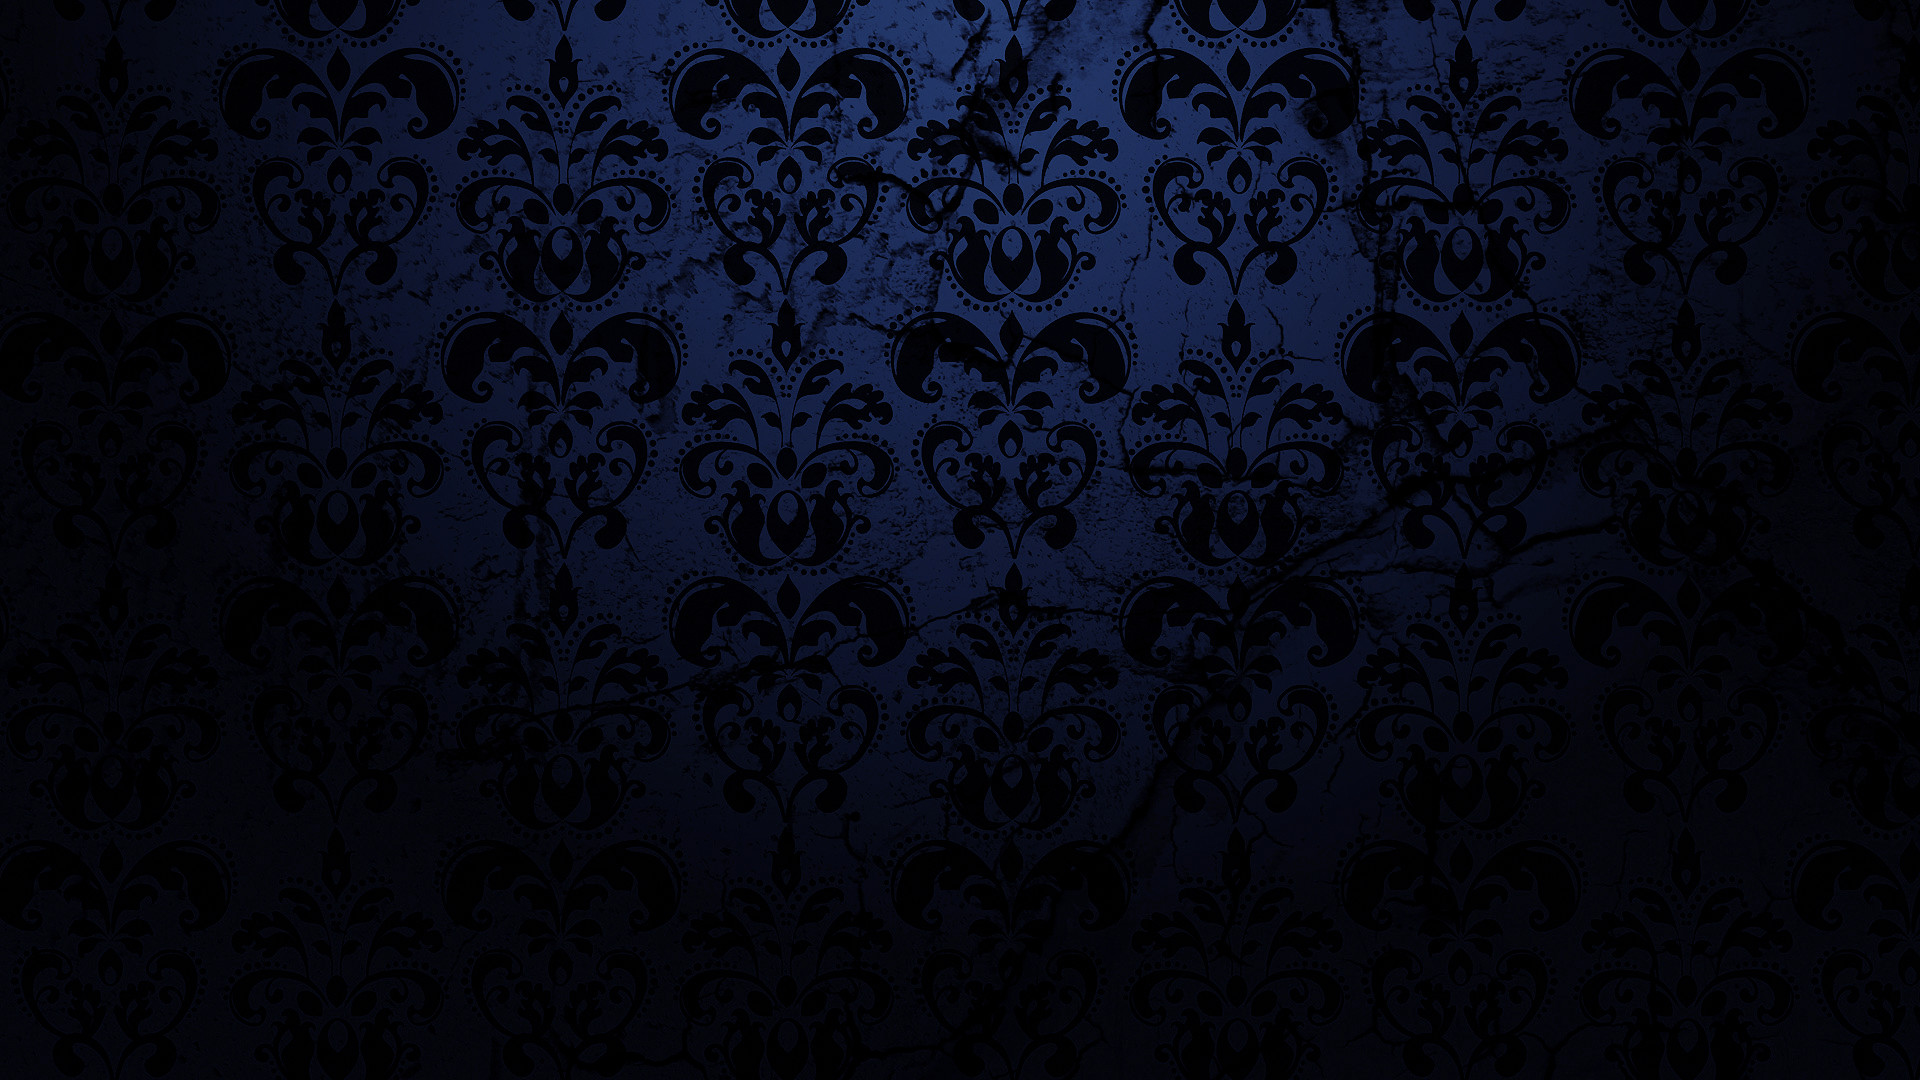 Desktop Wallpapers Patterns Group (68+)